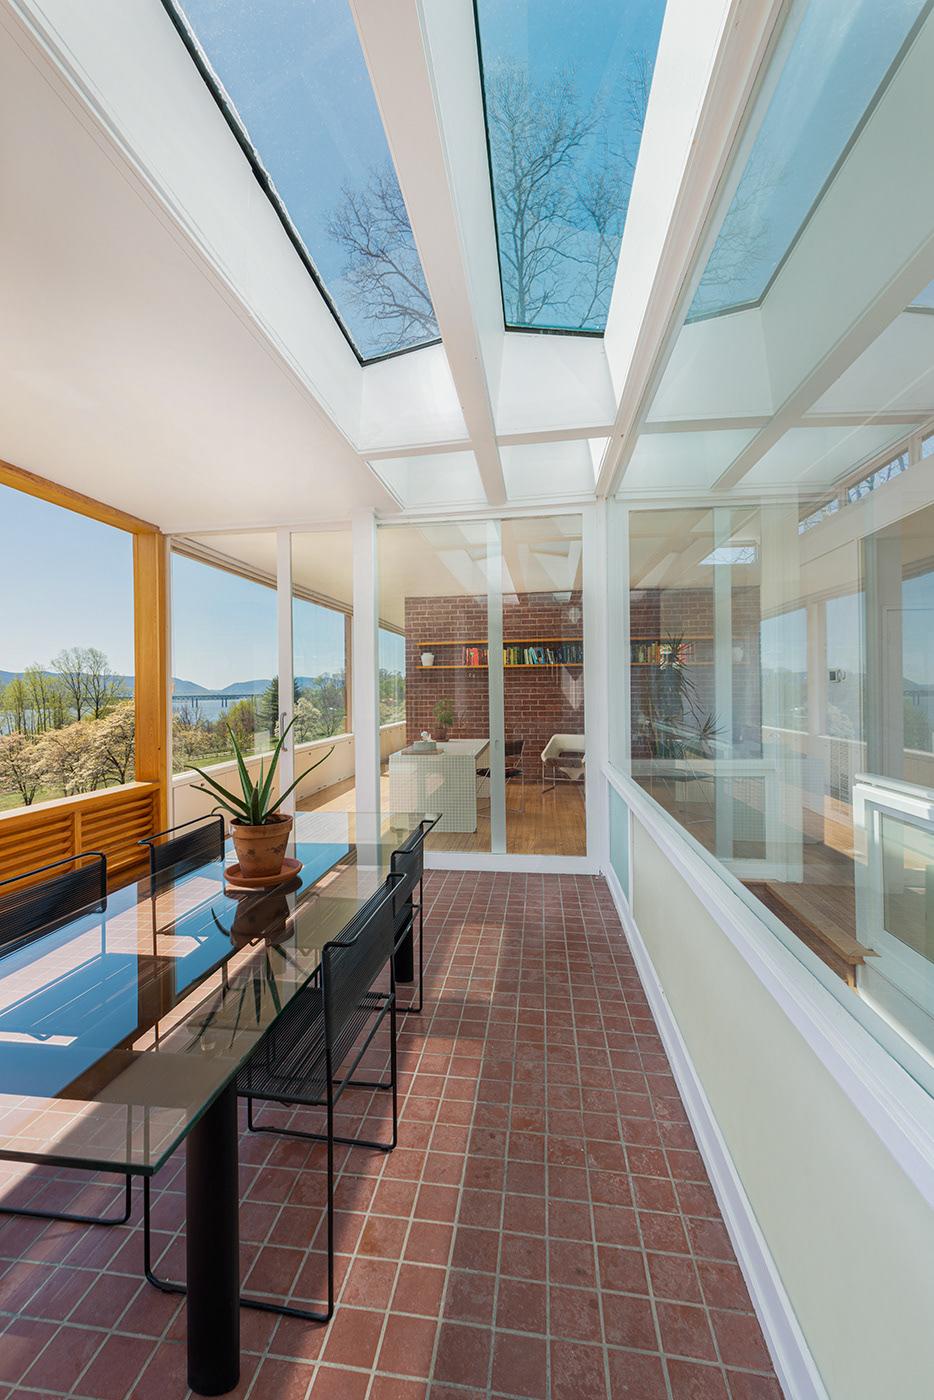 architect architecture design glass Interior Nature Photography